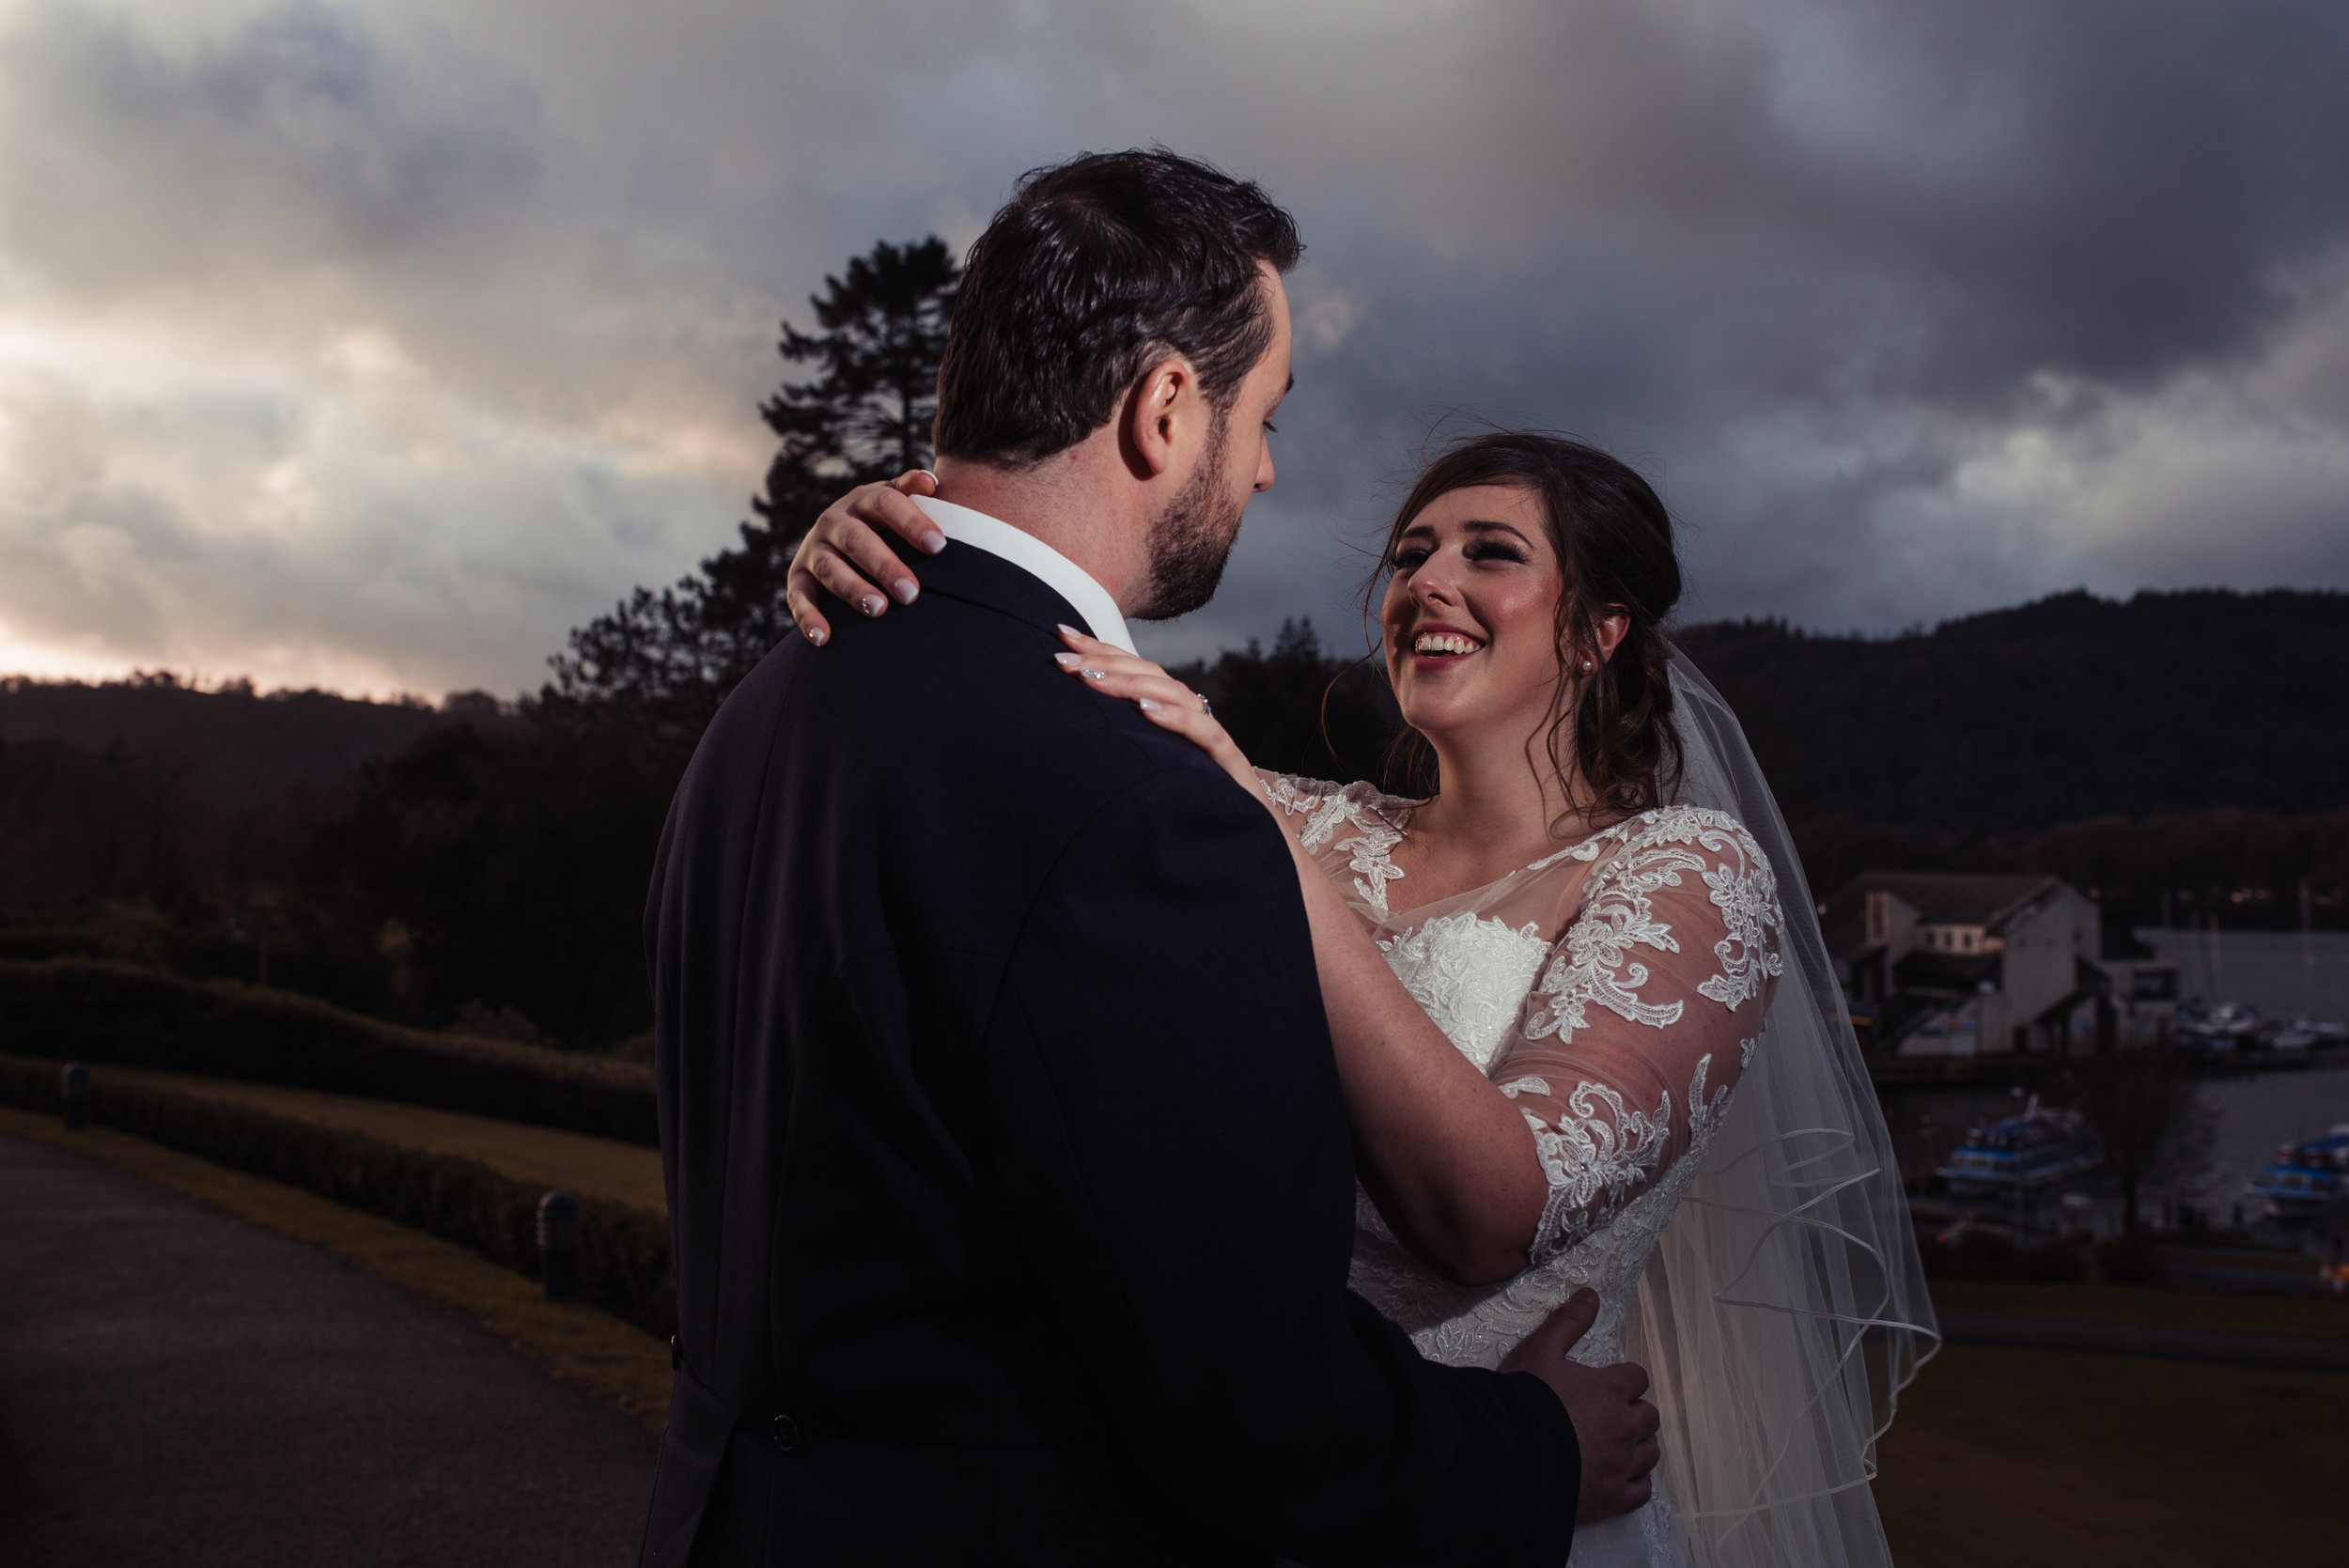 Belsfield-wedding-photography-27.jpg